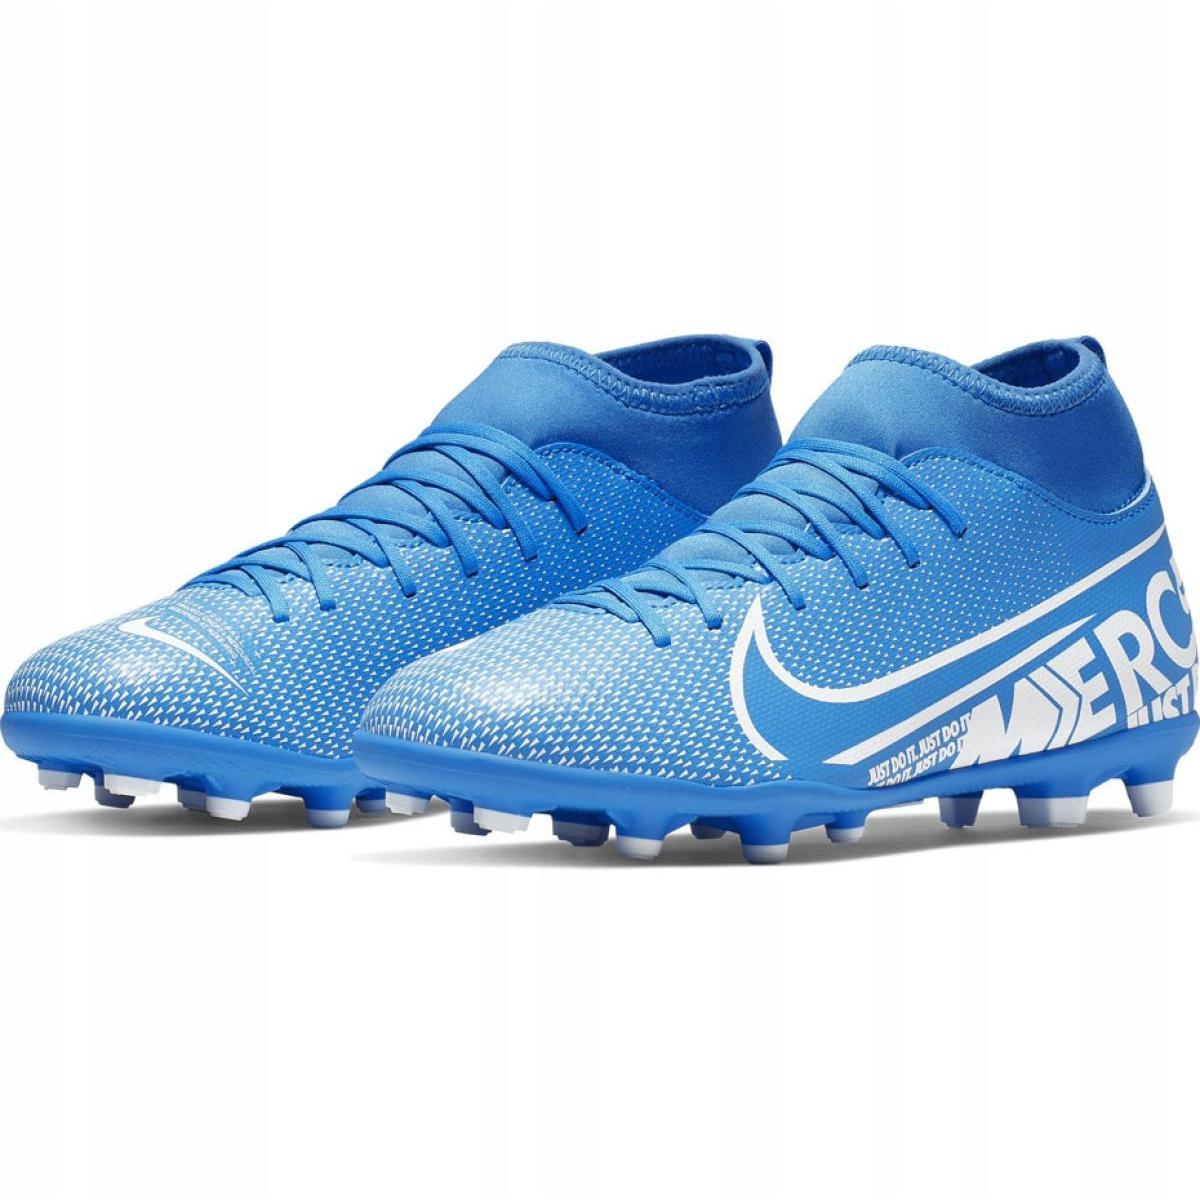 newest 0425c 2acf7 Football shoes Nike Mercurial Superfly 7 Club FG / MG Jr AT8150-414